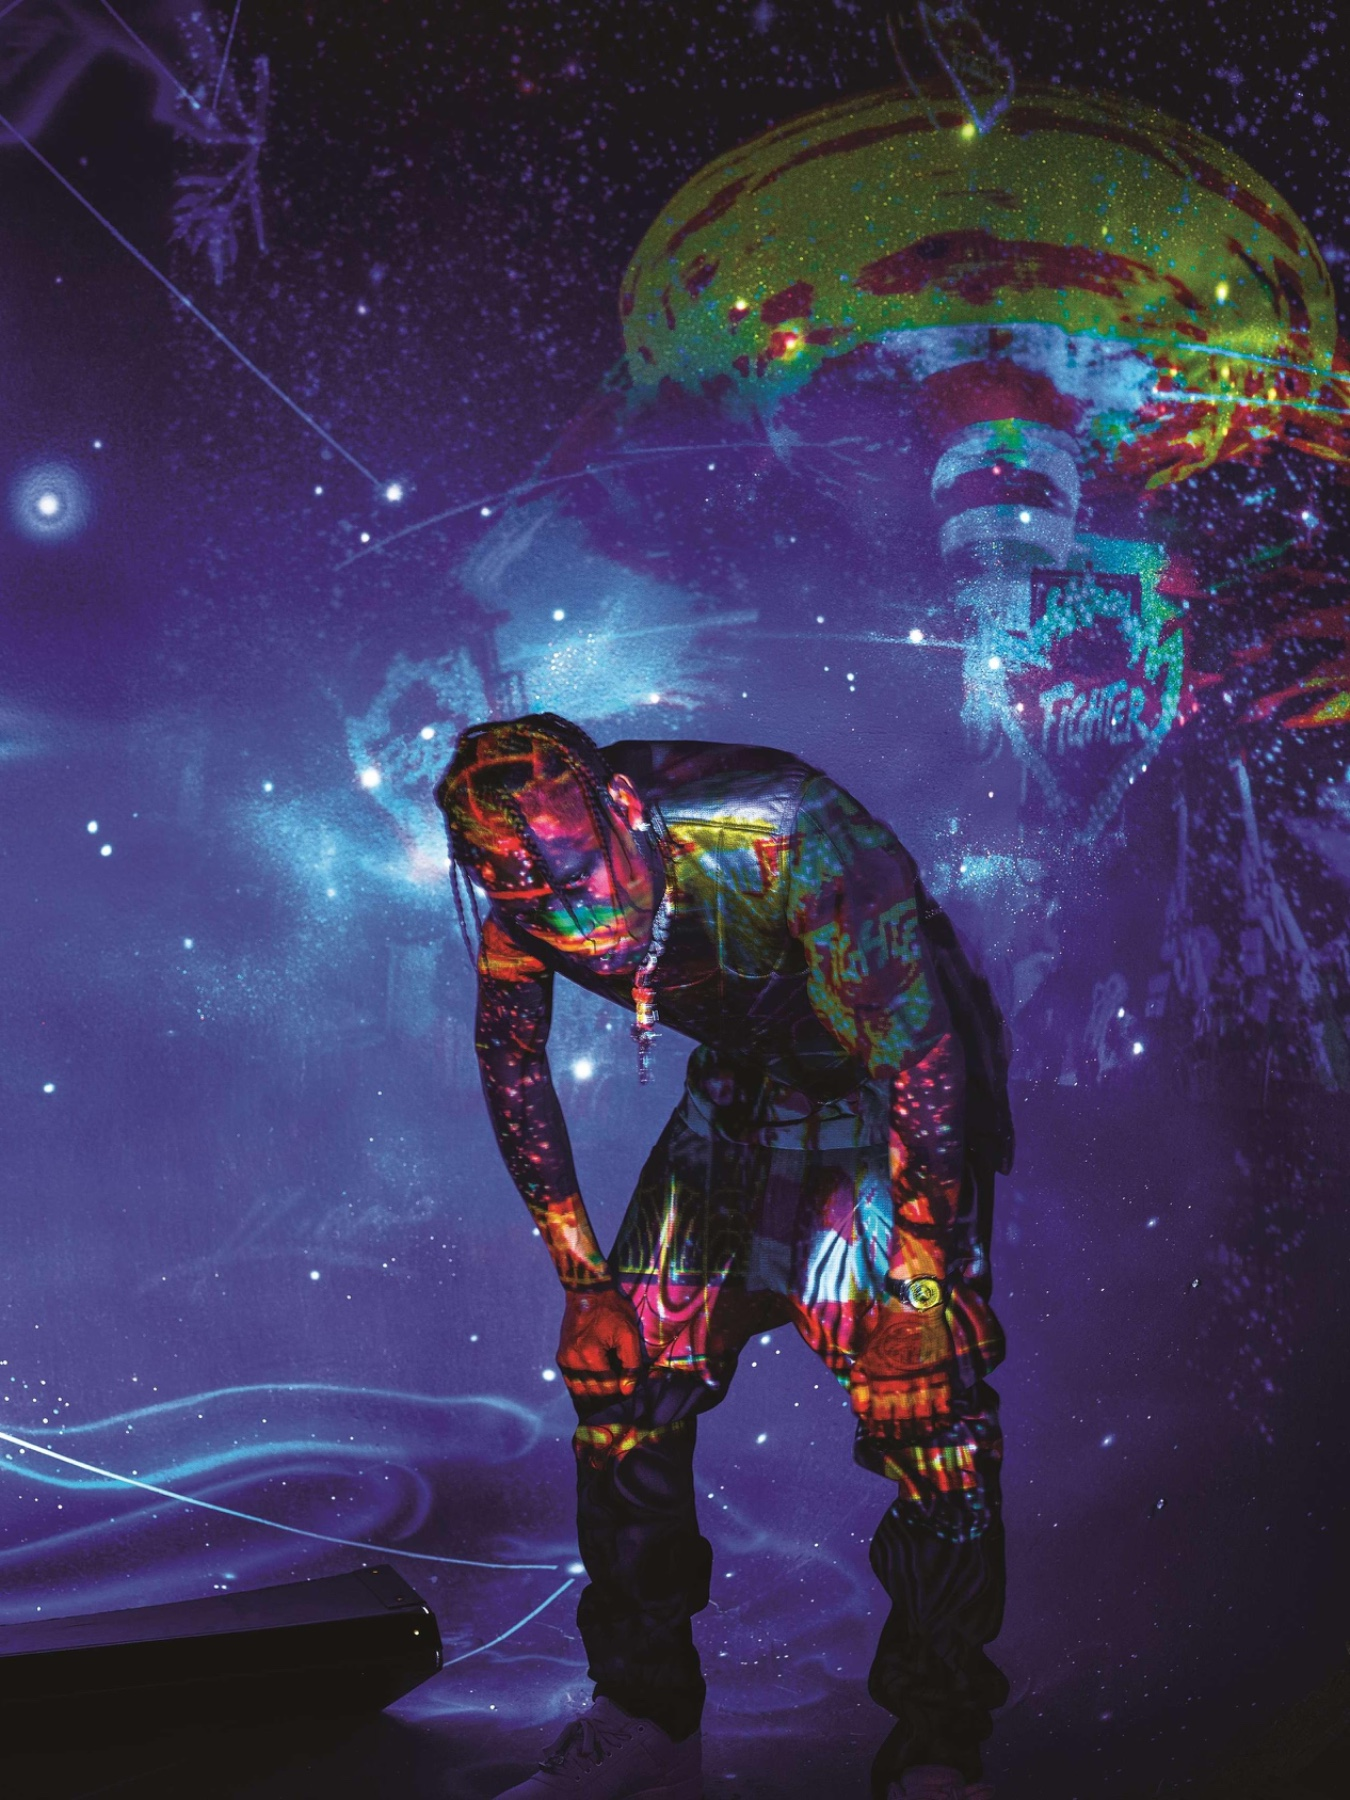 Astronomical concerto Travis Scott x Fortnite